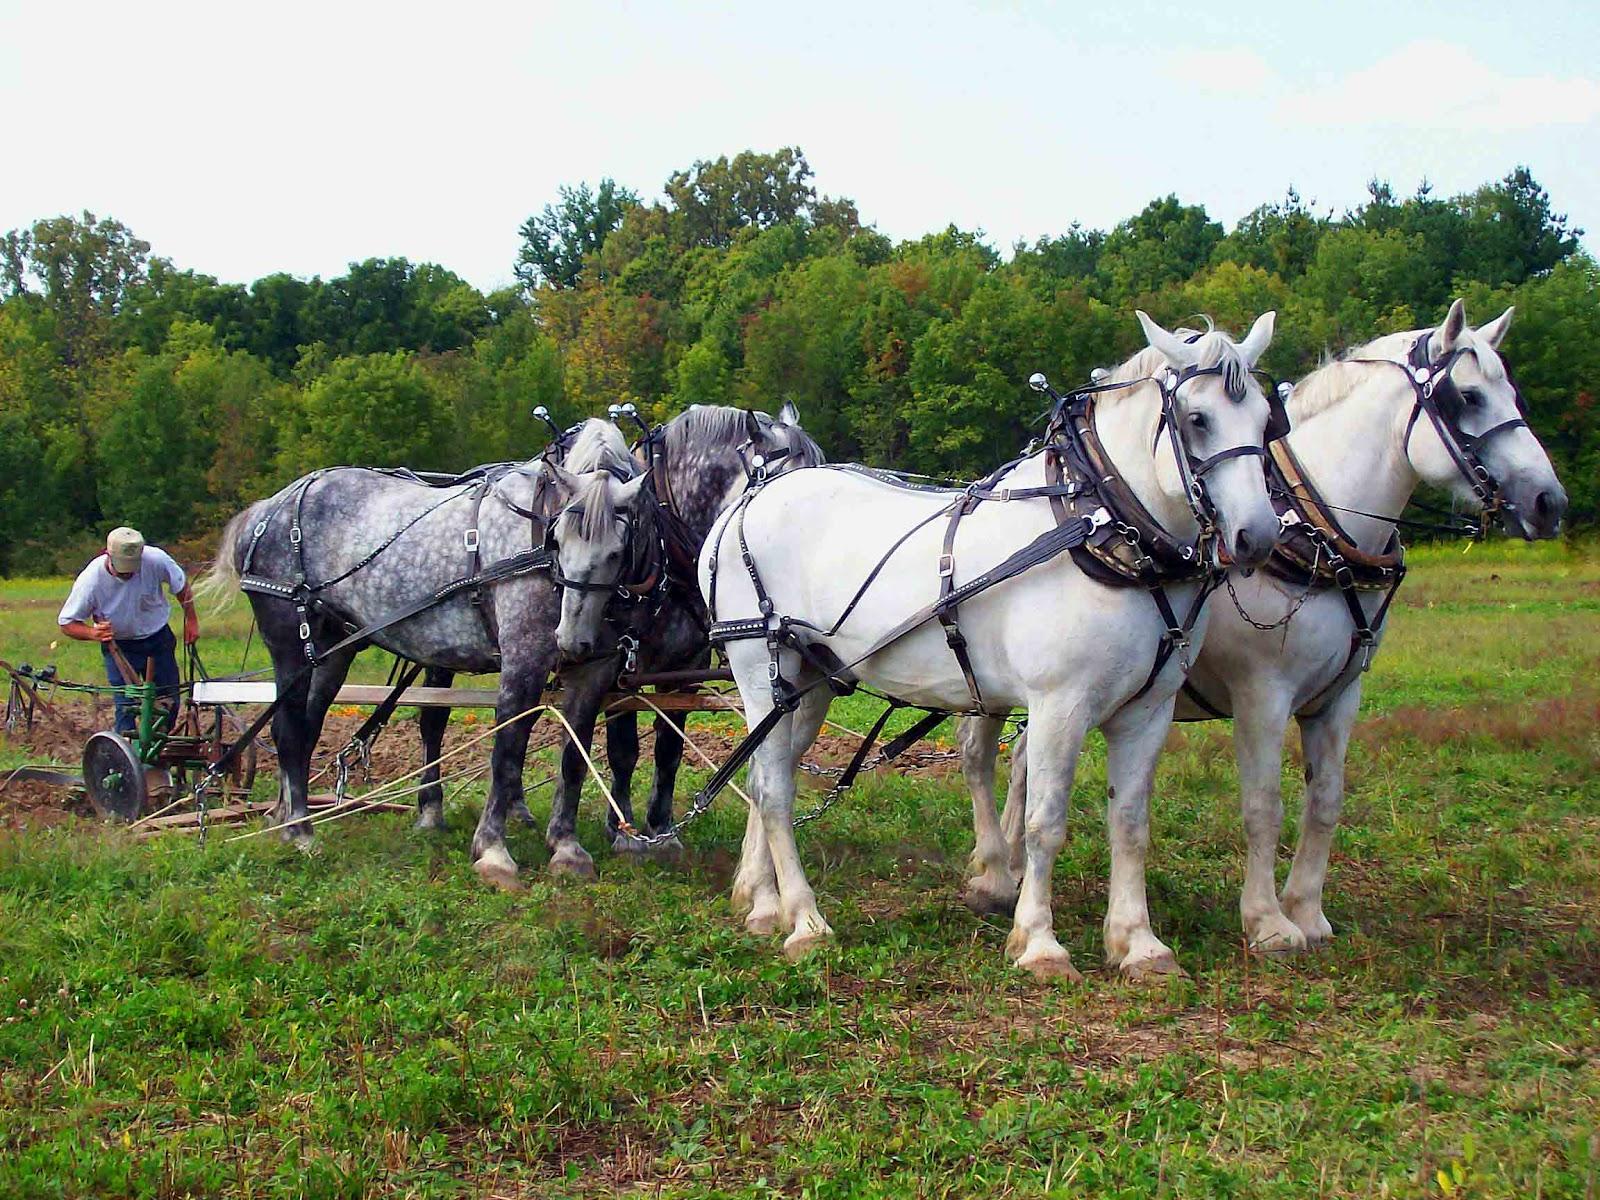 http://1.bp.blogspot.com/-6lQLufReoV0/Tzw-rFT3FWI/AAAAAAAAAoQ/KrZO8m82vFk/s1600/Four+White+Horses.jpg